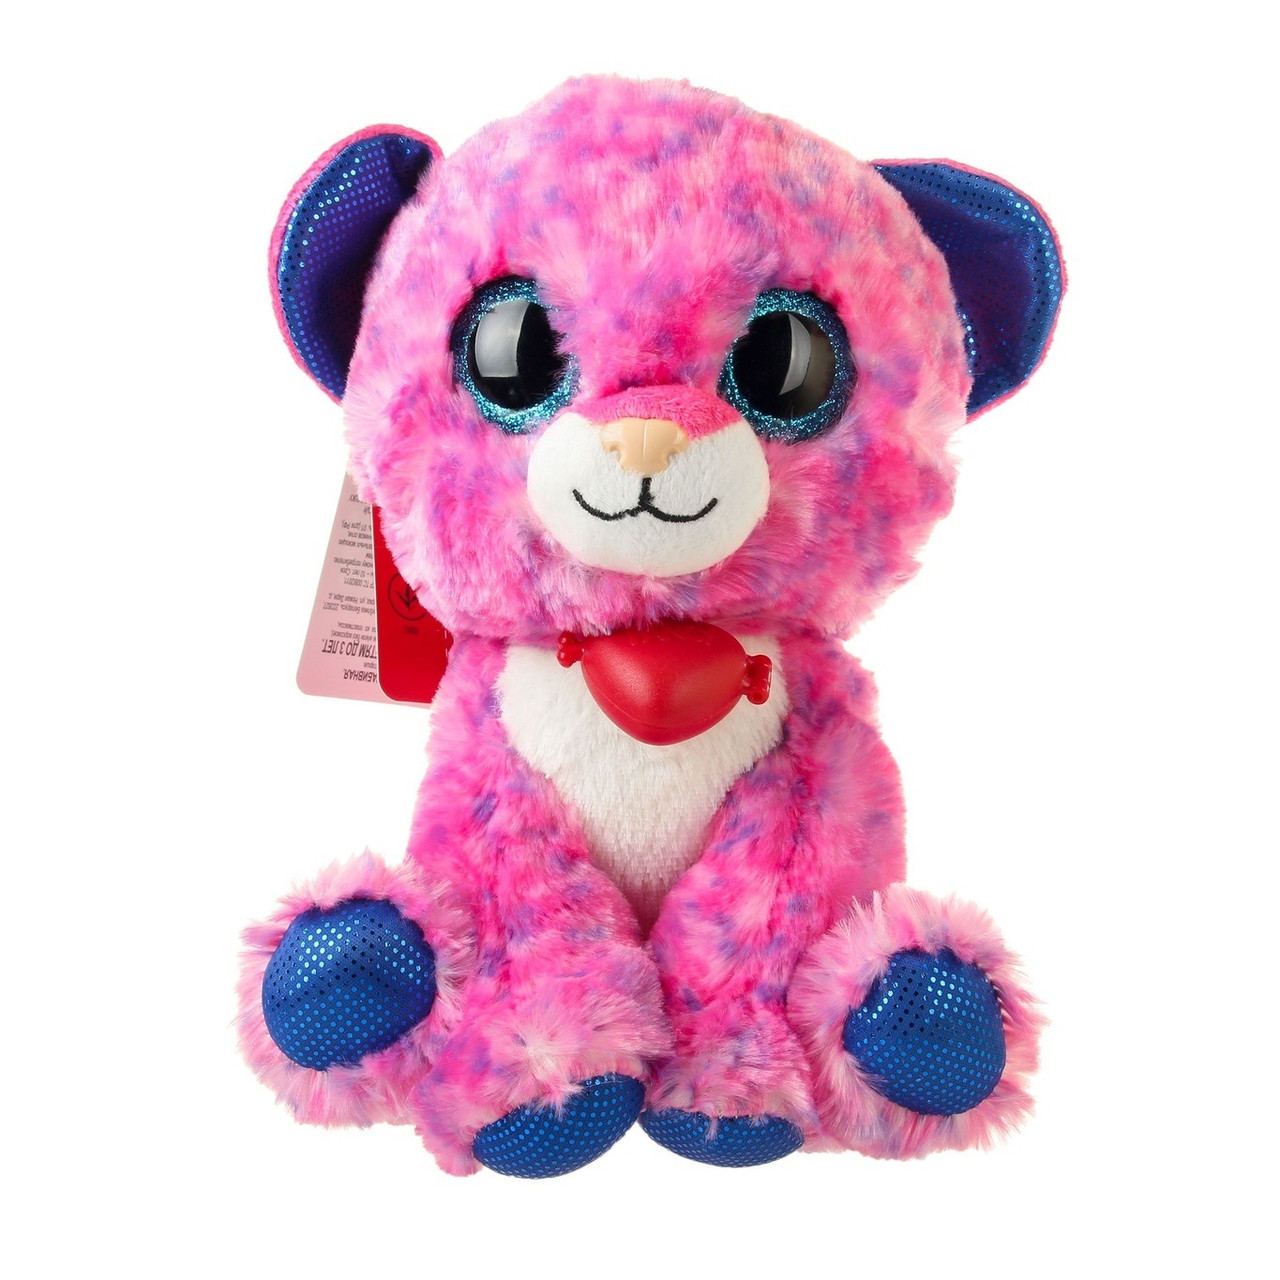 Мягкая игрушка Глазастик Леопард 23 см Fancy GLP0R\S